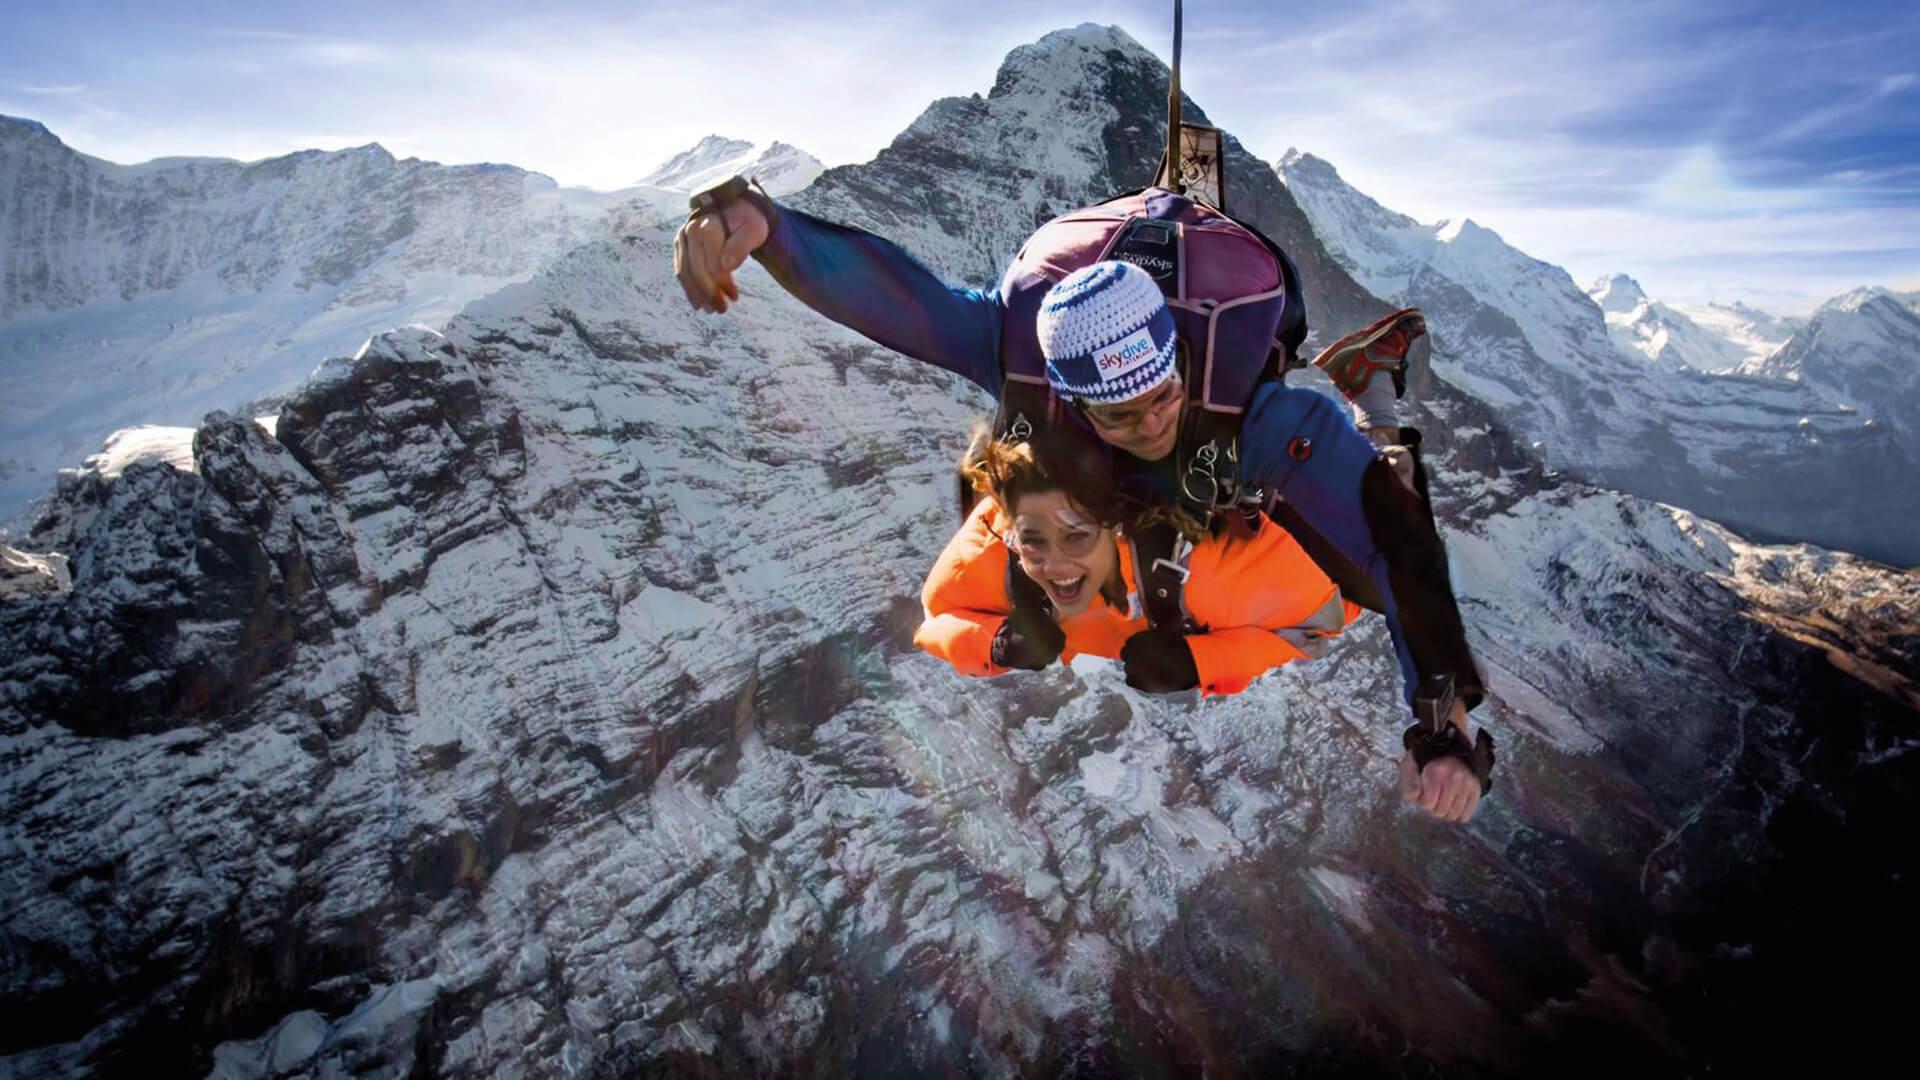 skydive-interlaken-eiger-jump-winter-pure-adrenalin